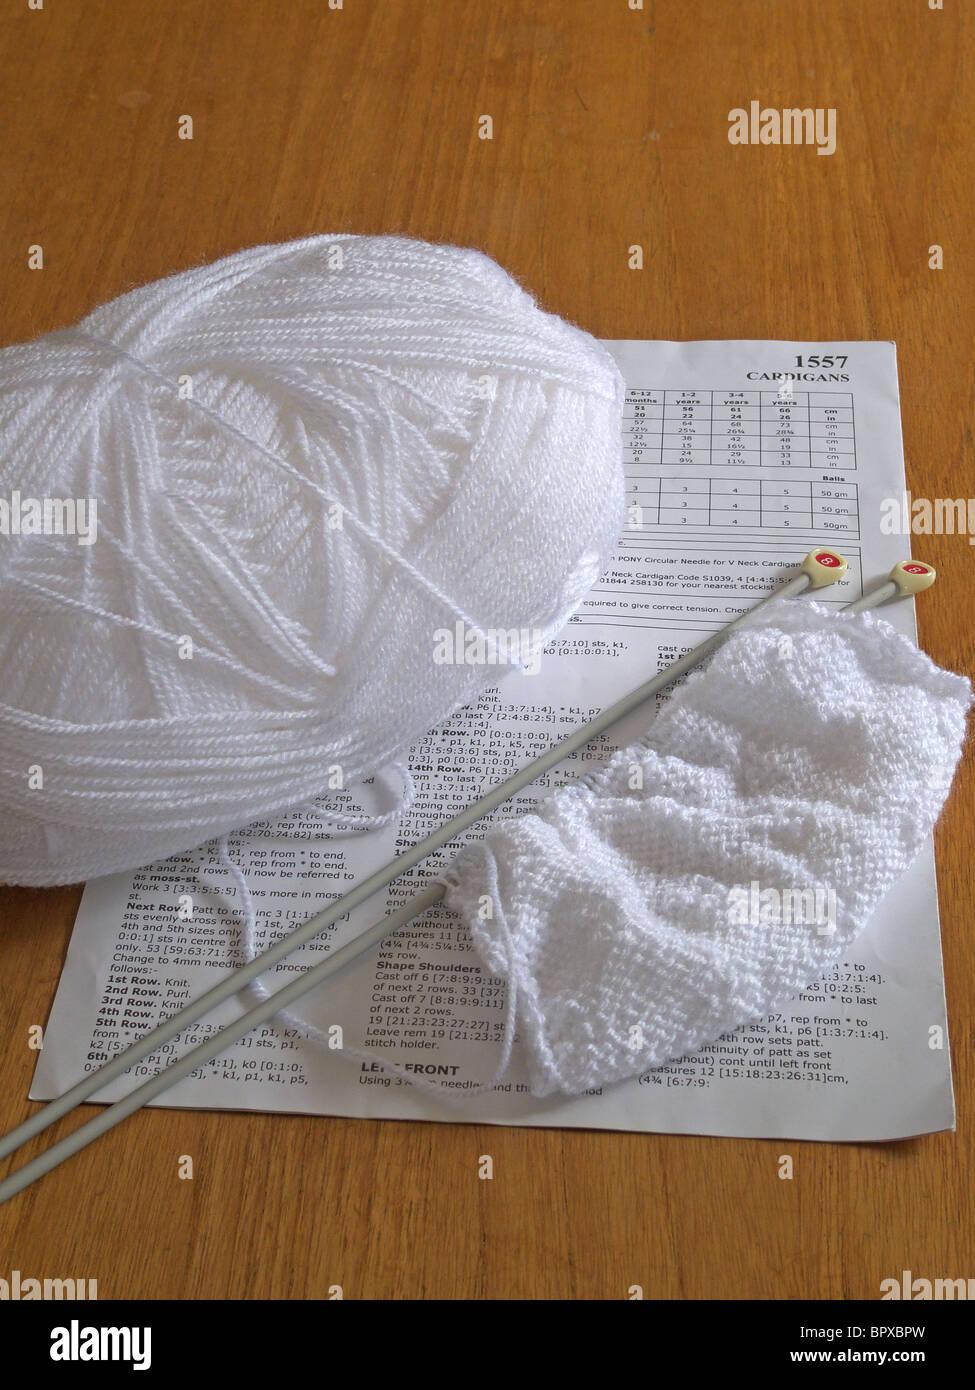 Ball Of White Wool Imágenes De Stock & Ball Of White Wool Fotos De ...